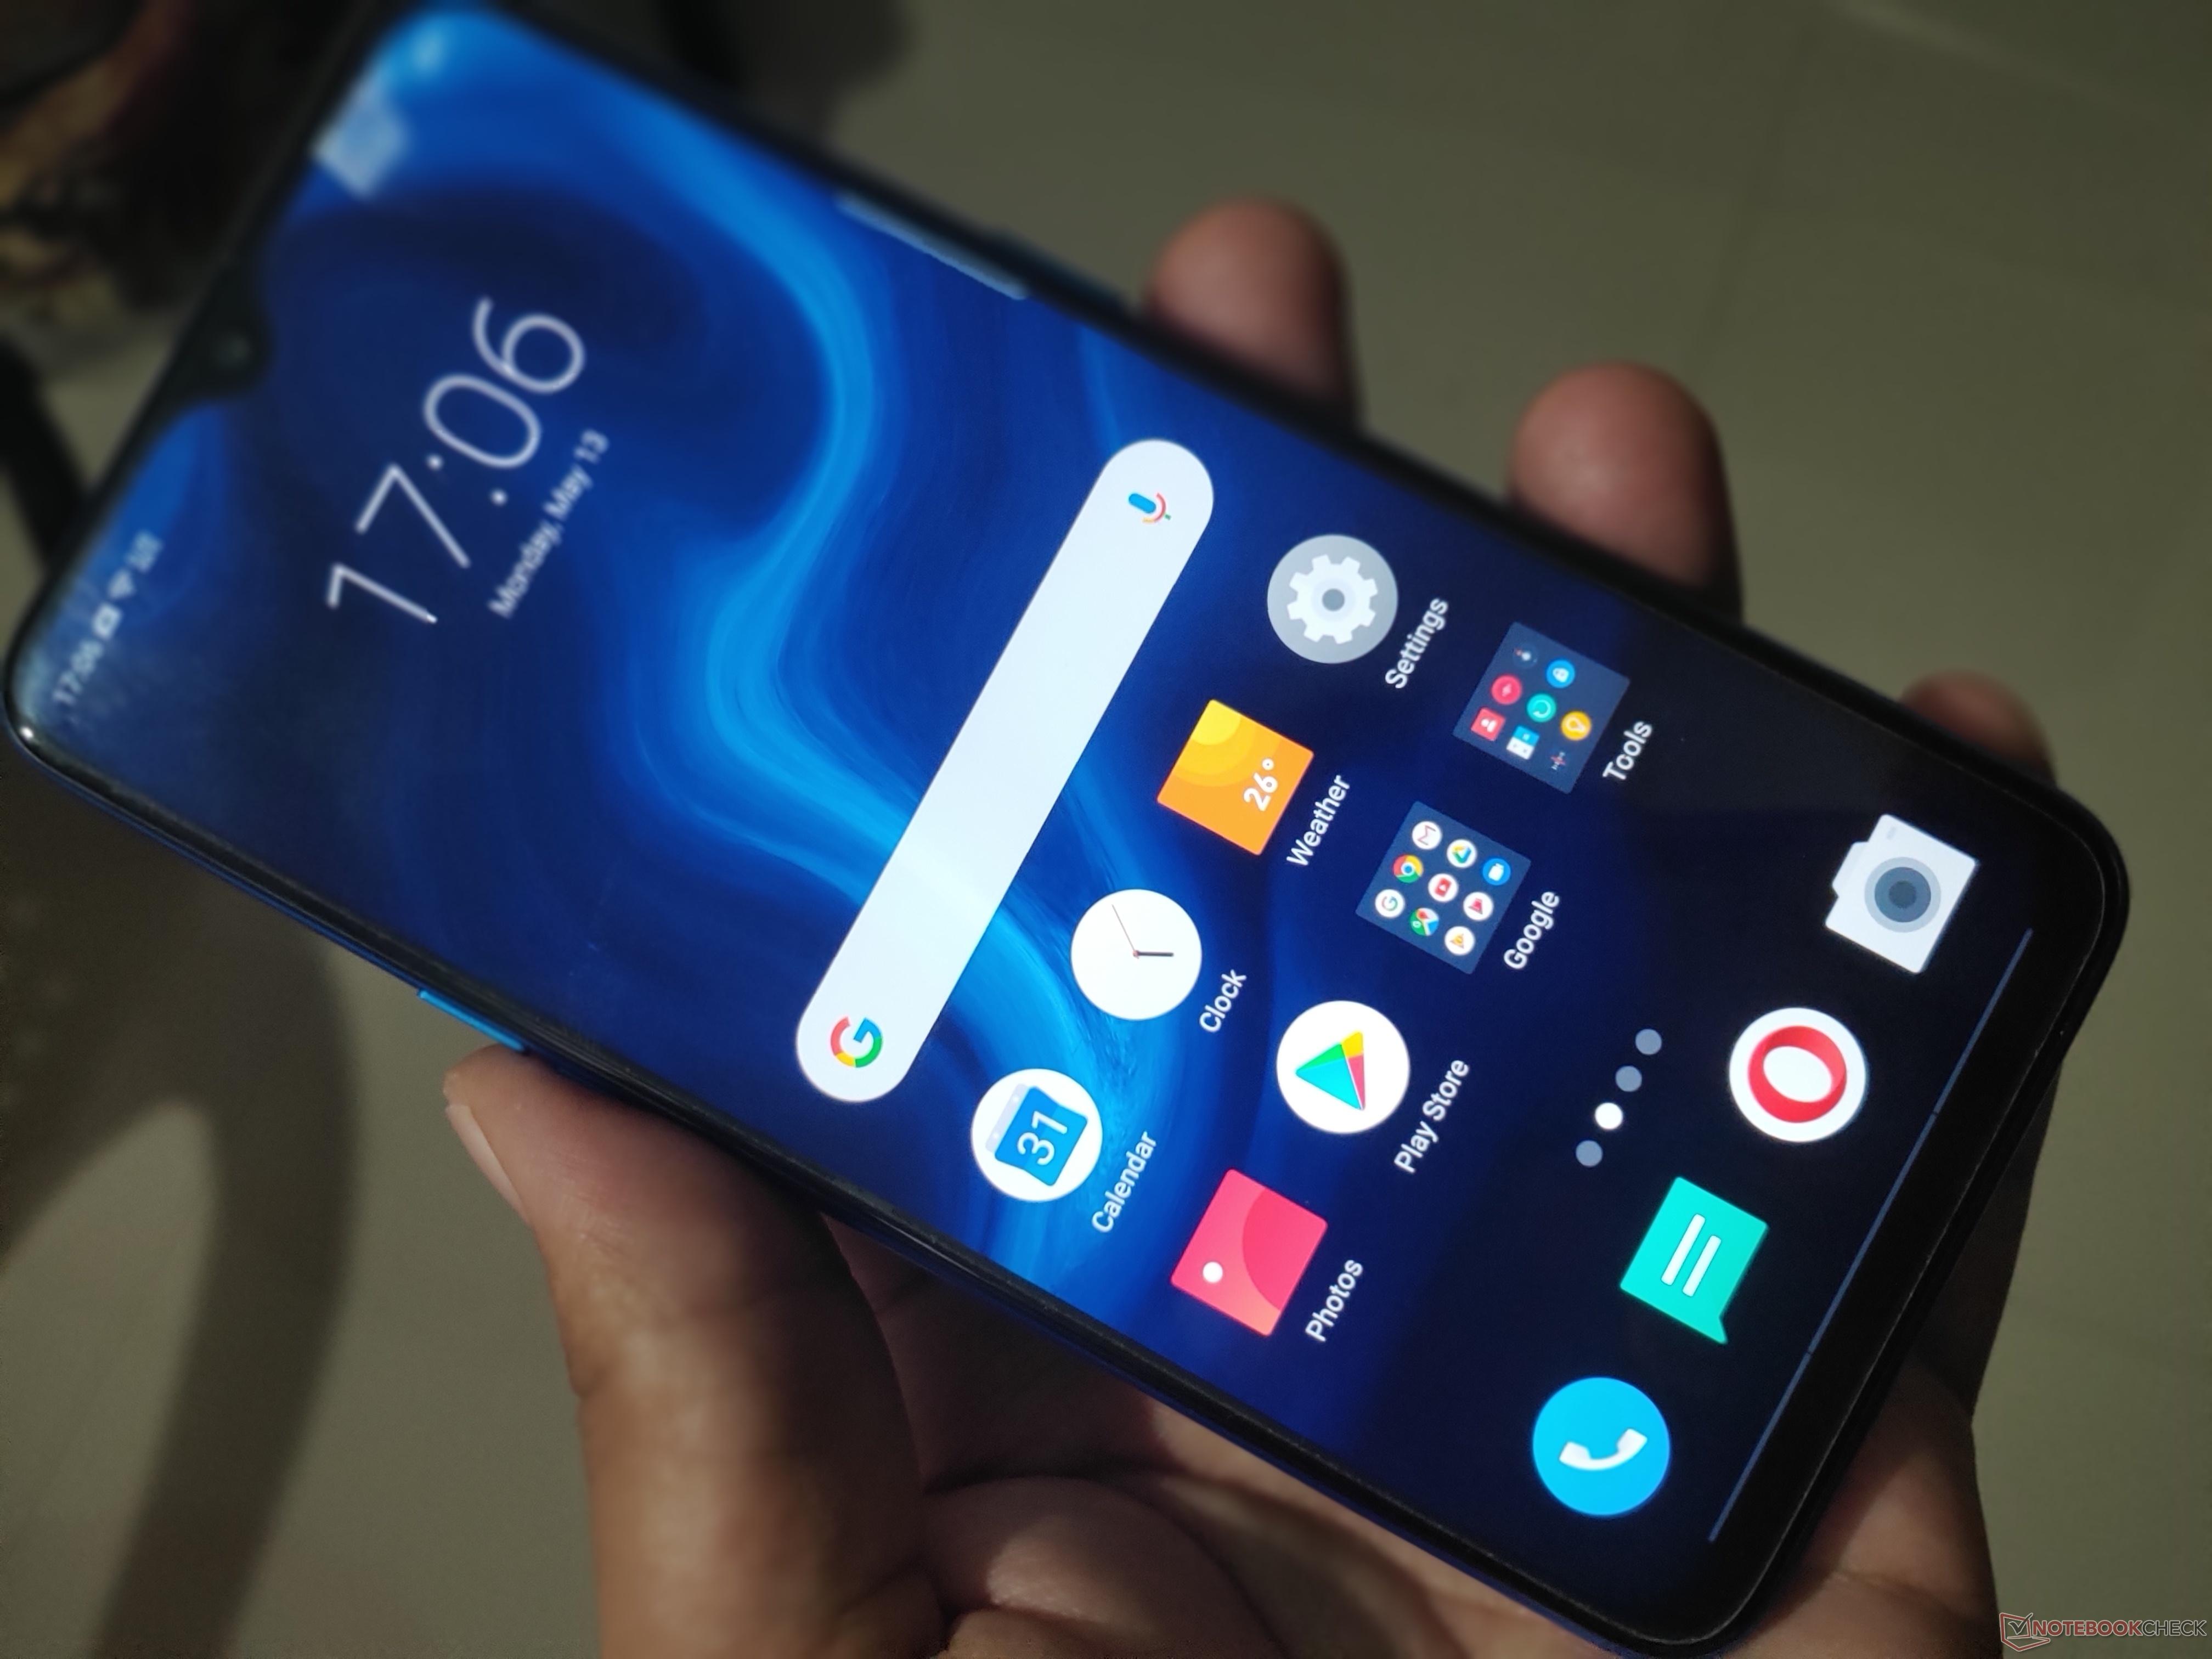 Realme U1 Smartphone Hands-on Review - NotebookCheck net Reviews